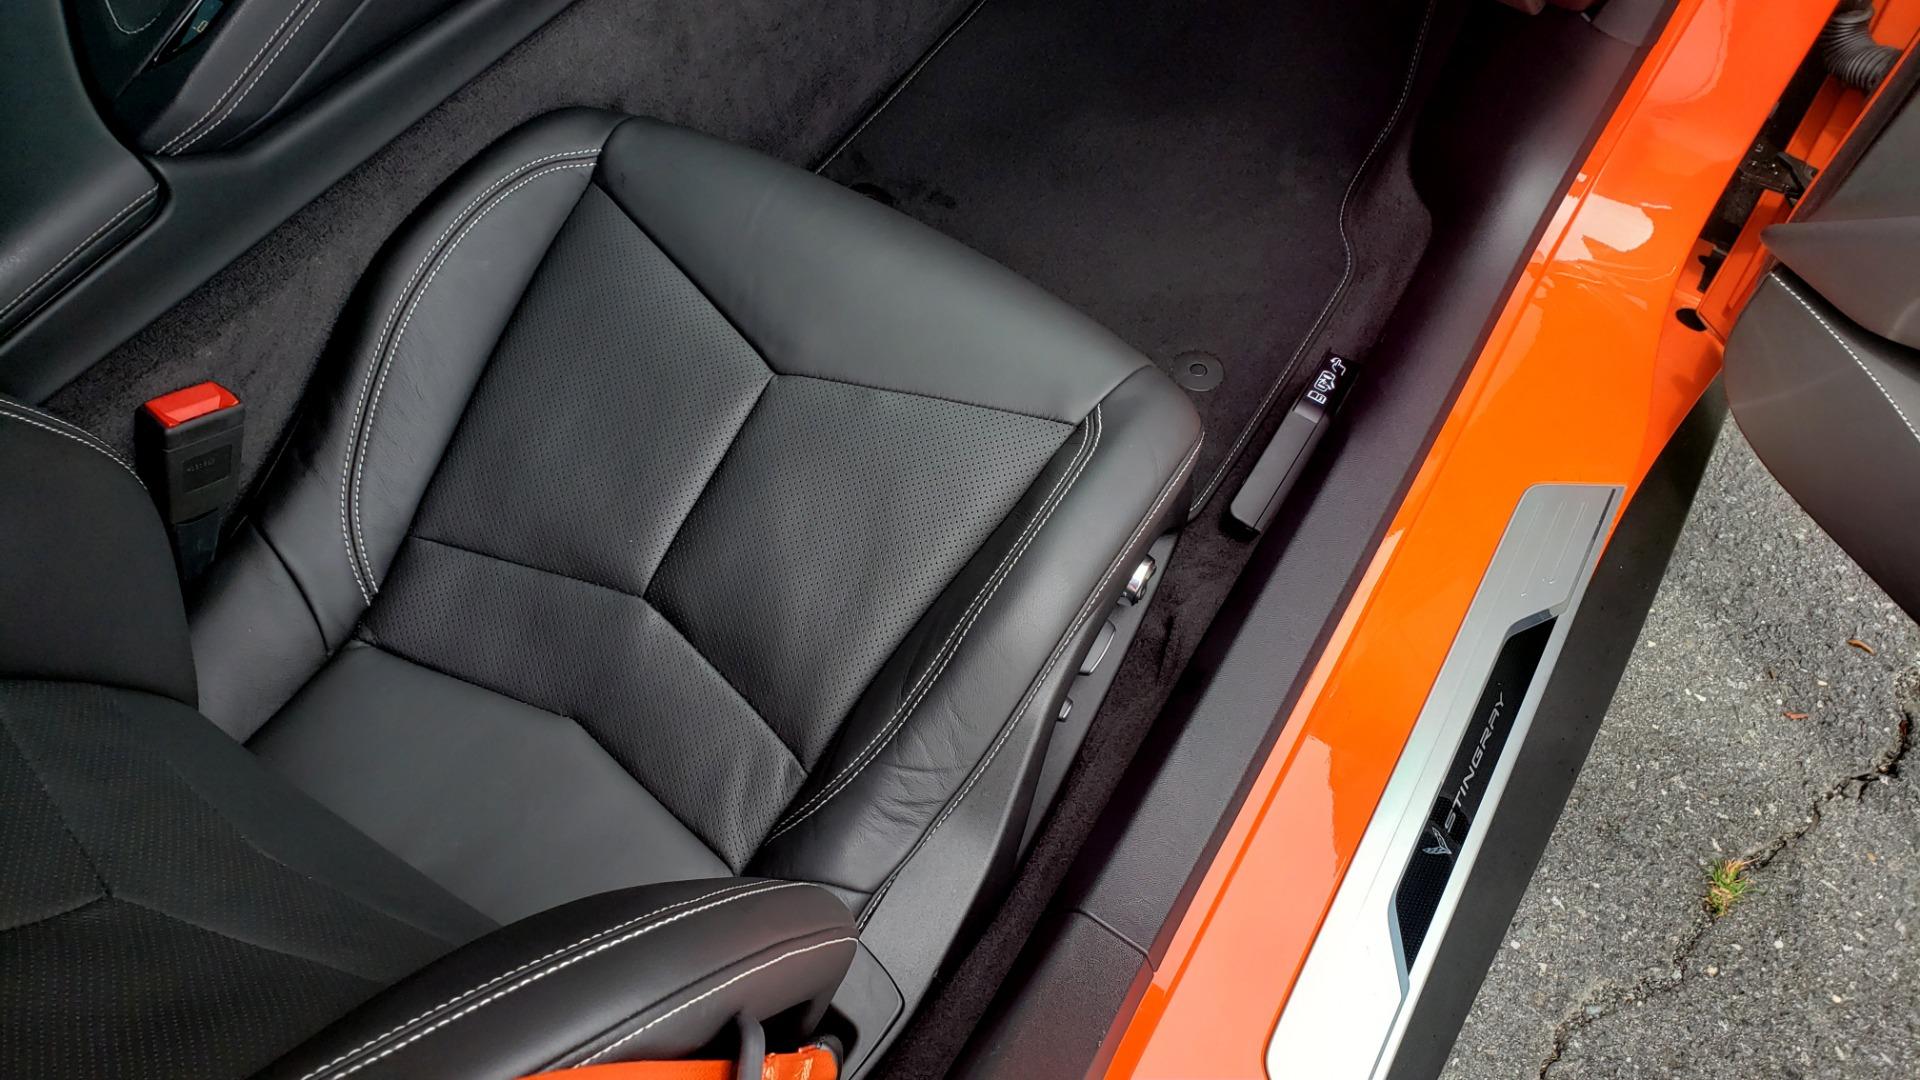 Used 2020 Chevrolet CORVETTE C8 STINGRAY 2LT / 6.2L V8 / 8-SPD AUTO / NAV / BOSE / REARVIEW / DATA RECOR for sale Sold at Formula Imports in Charlotte NC 28227 63